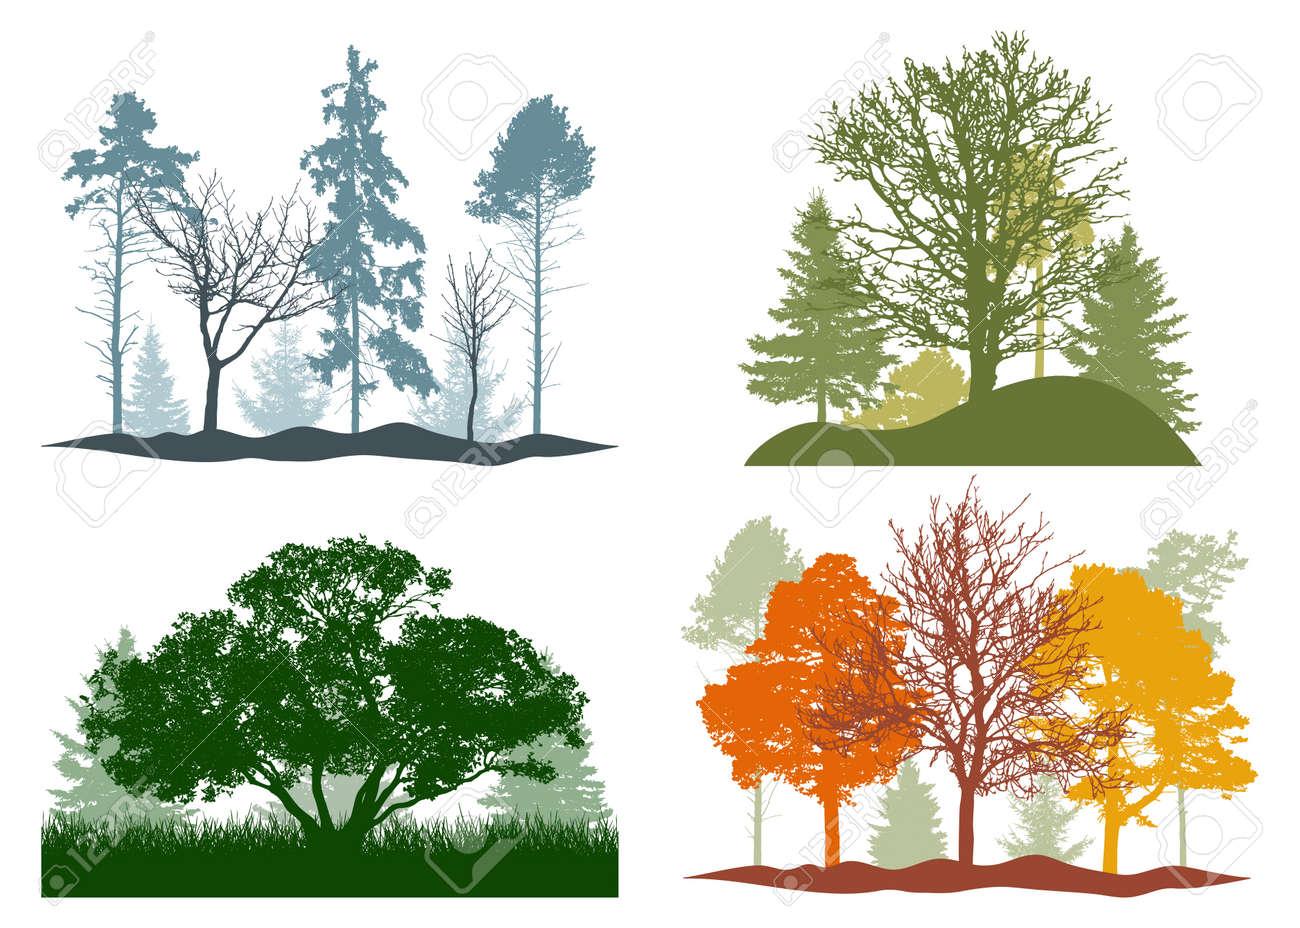 Four seasons, silhouette of summer, autumn, winter, spring woodland, landscape. Vector illustration - 170586875